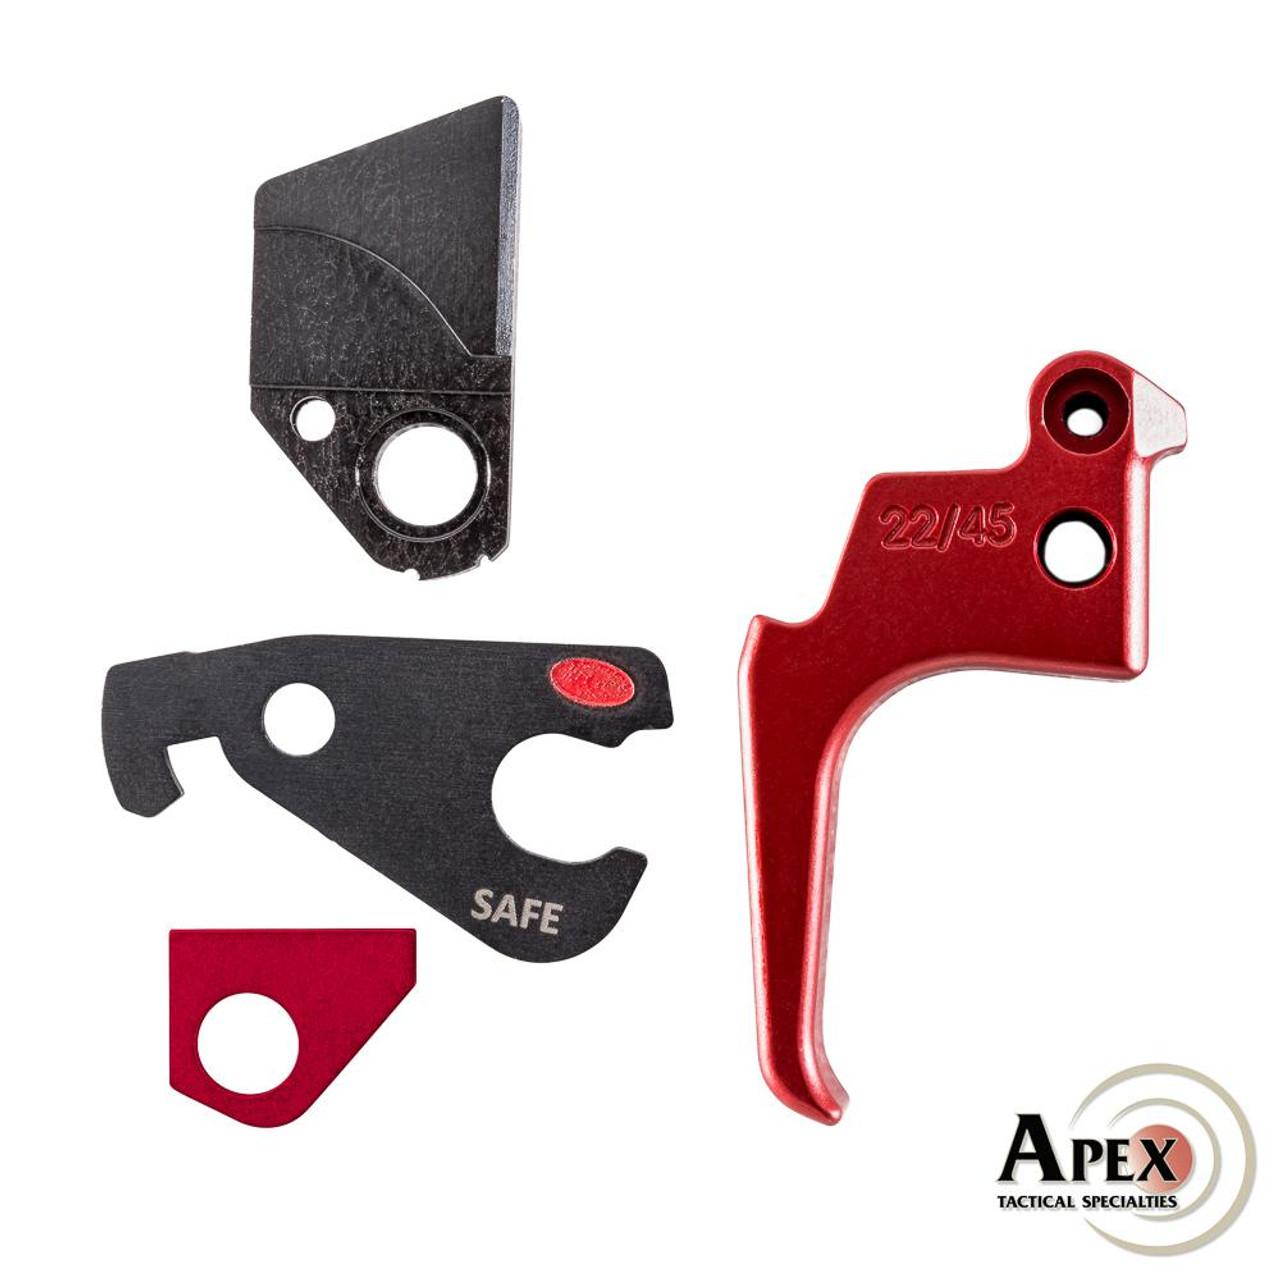 Apex Tactical Action Enhancement Kit for Ruger Mk IV 22/45 - Red